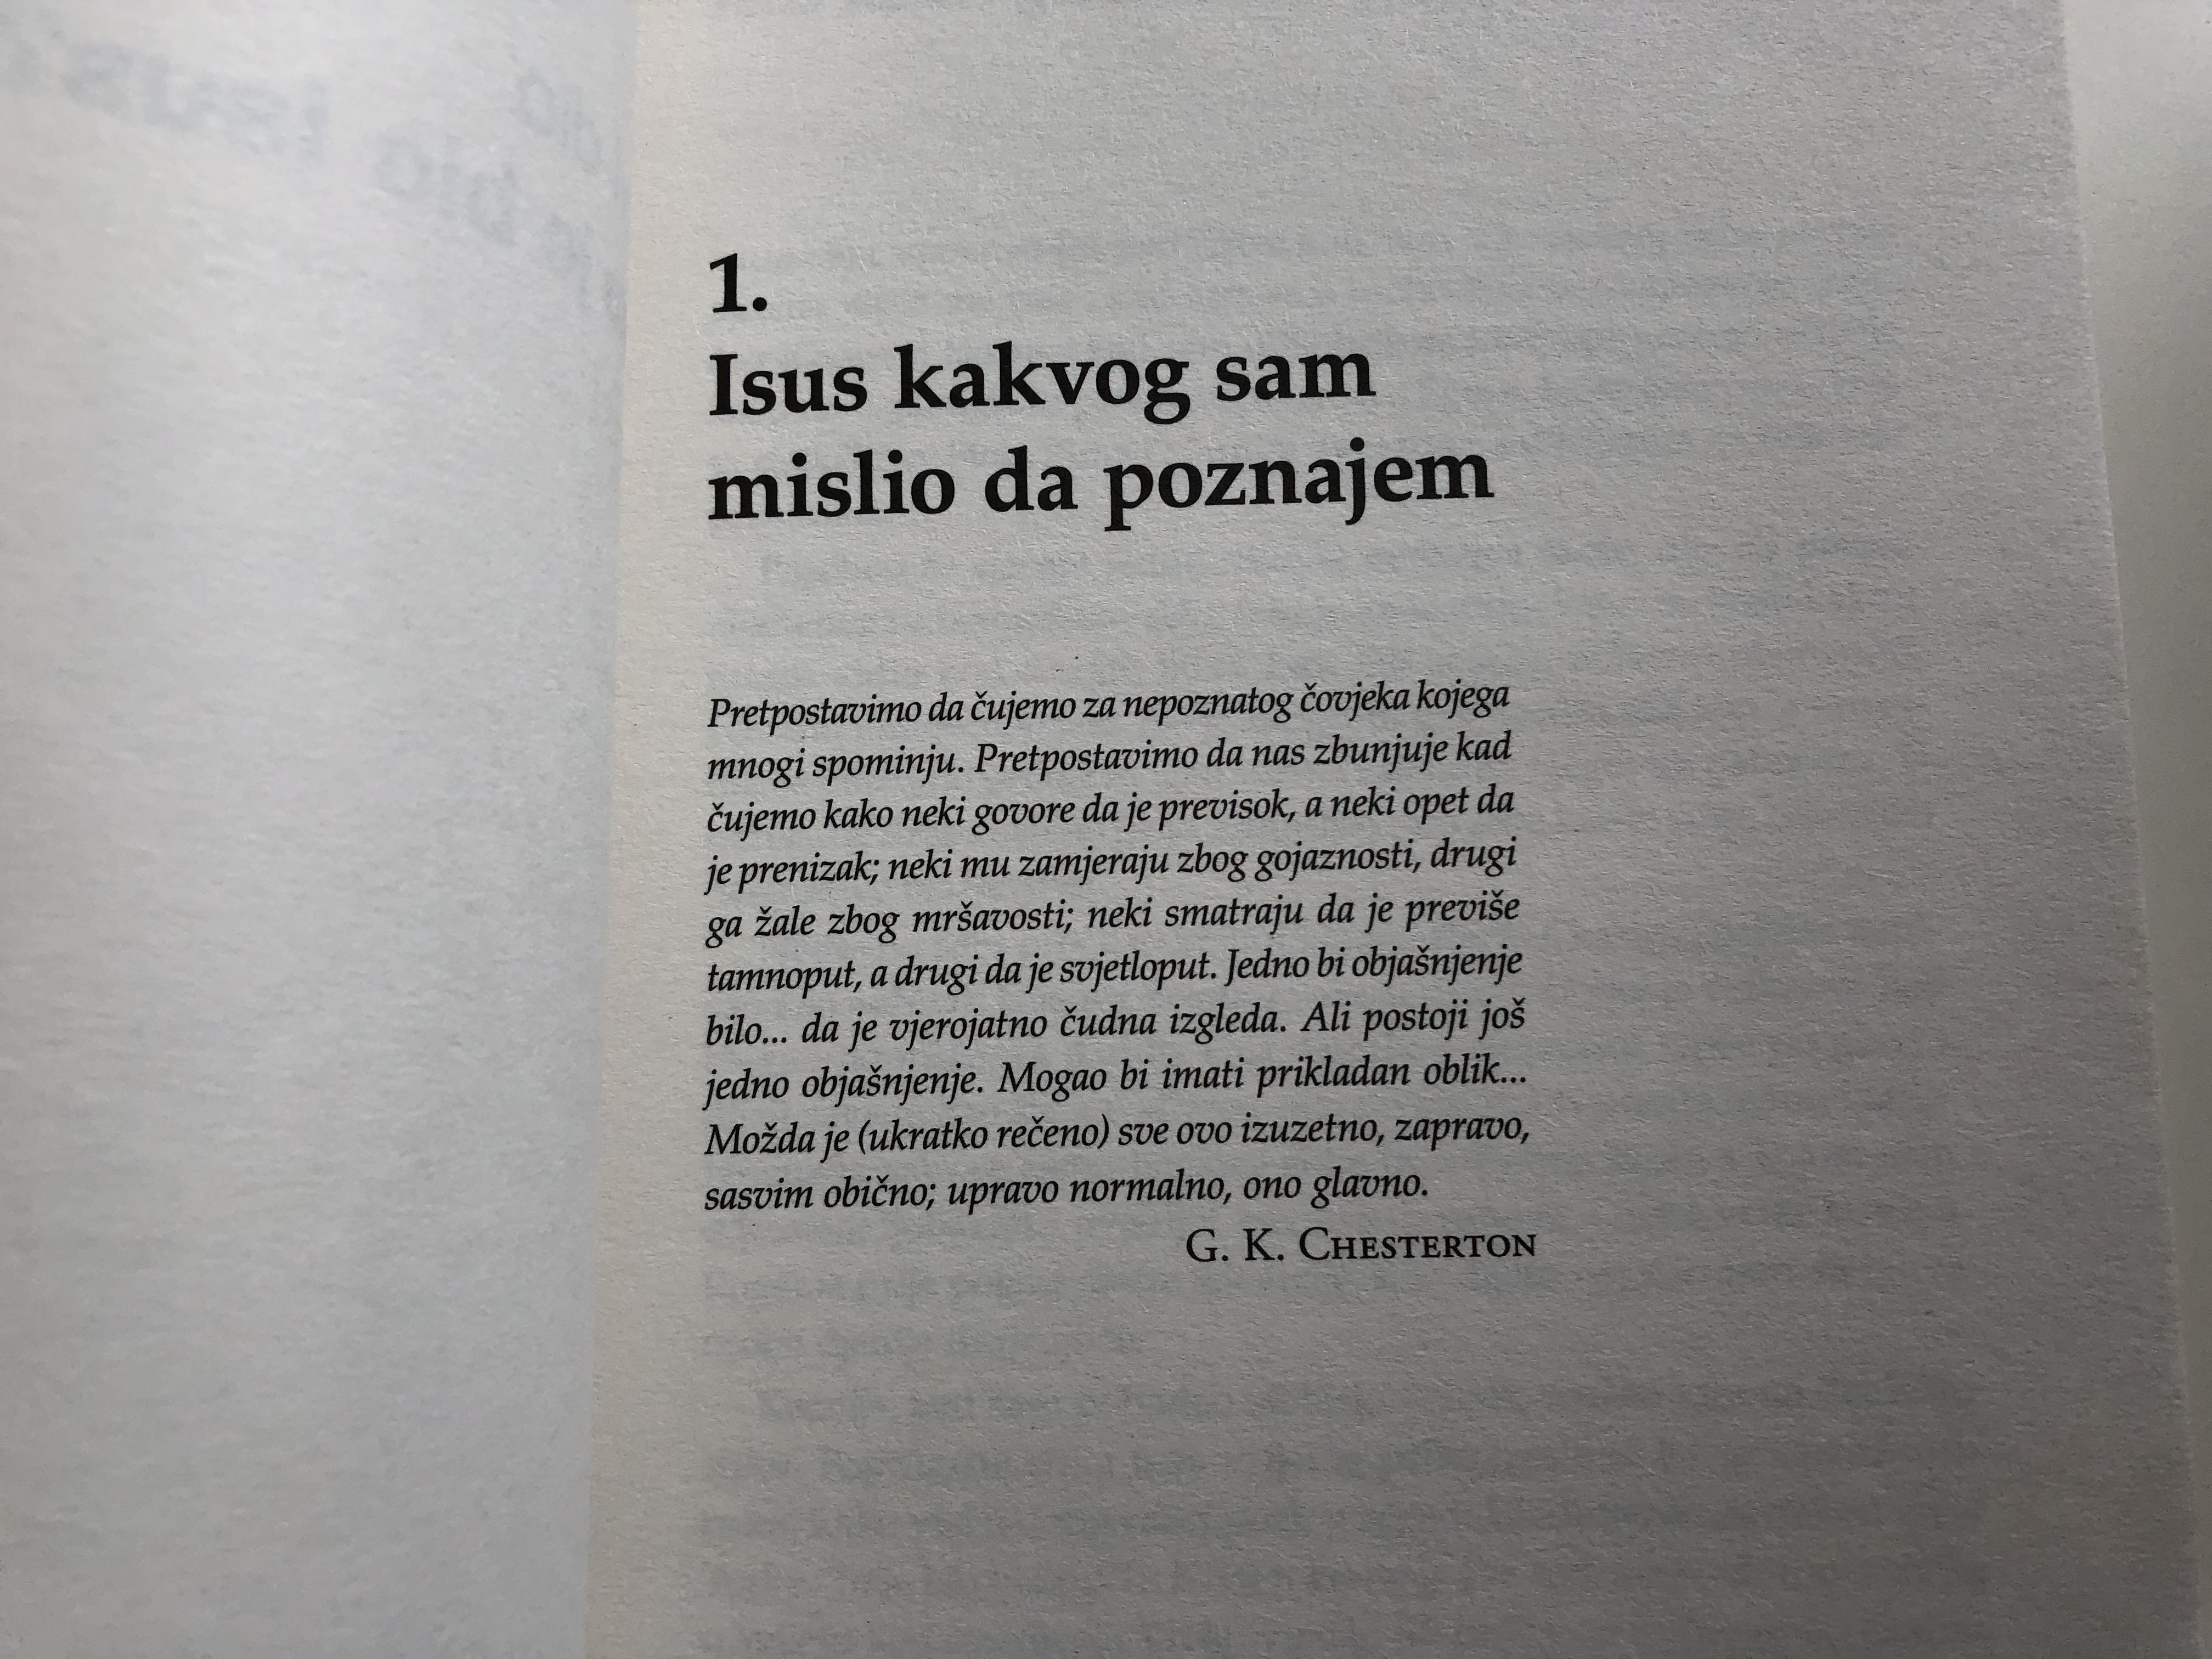 isus-kakvog-nisam-poznavao-by-philip-yancey-croatian-language-edition-5.jpg